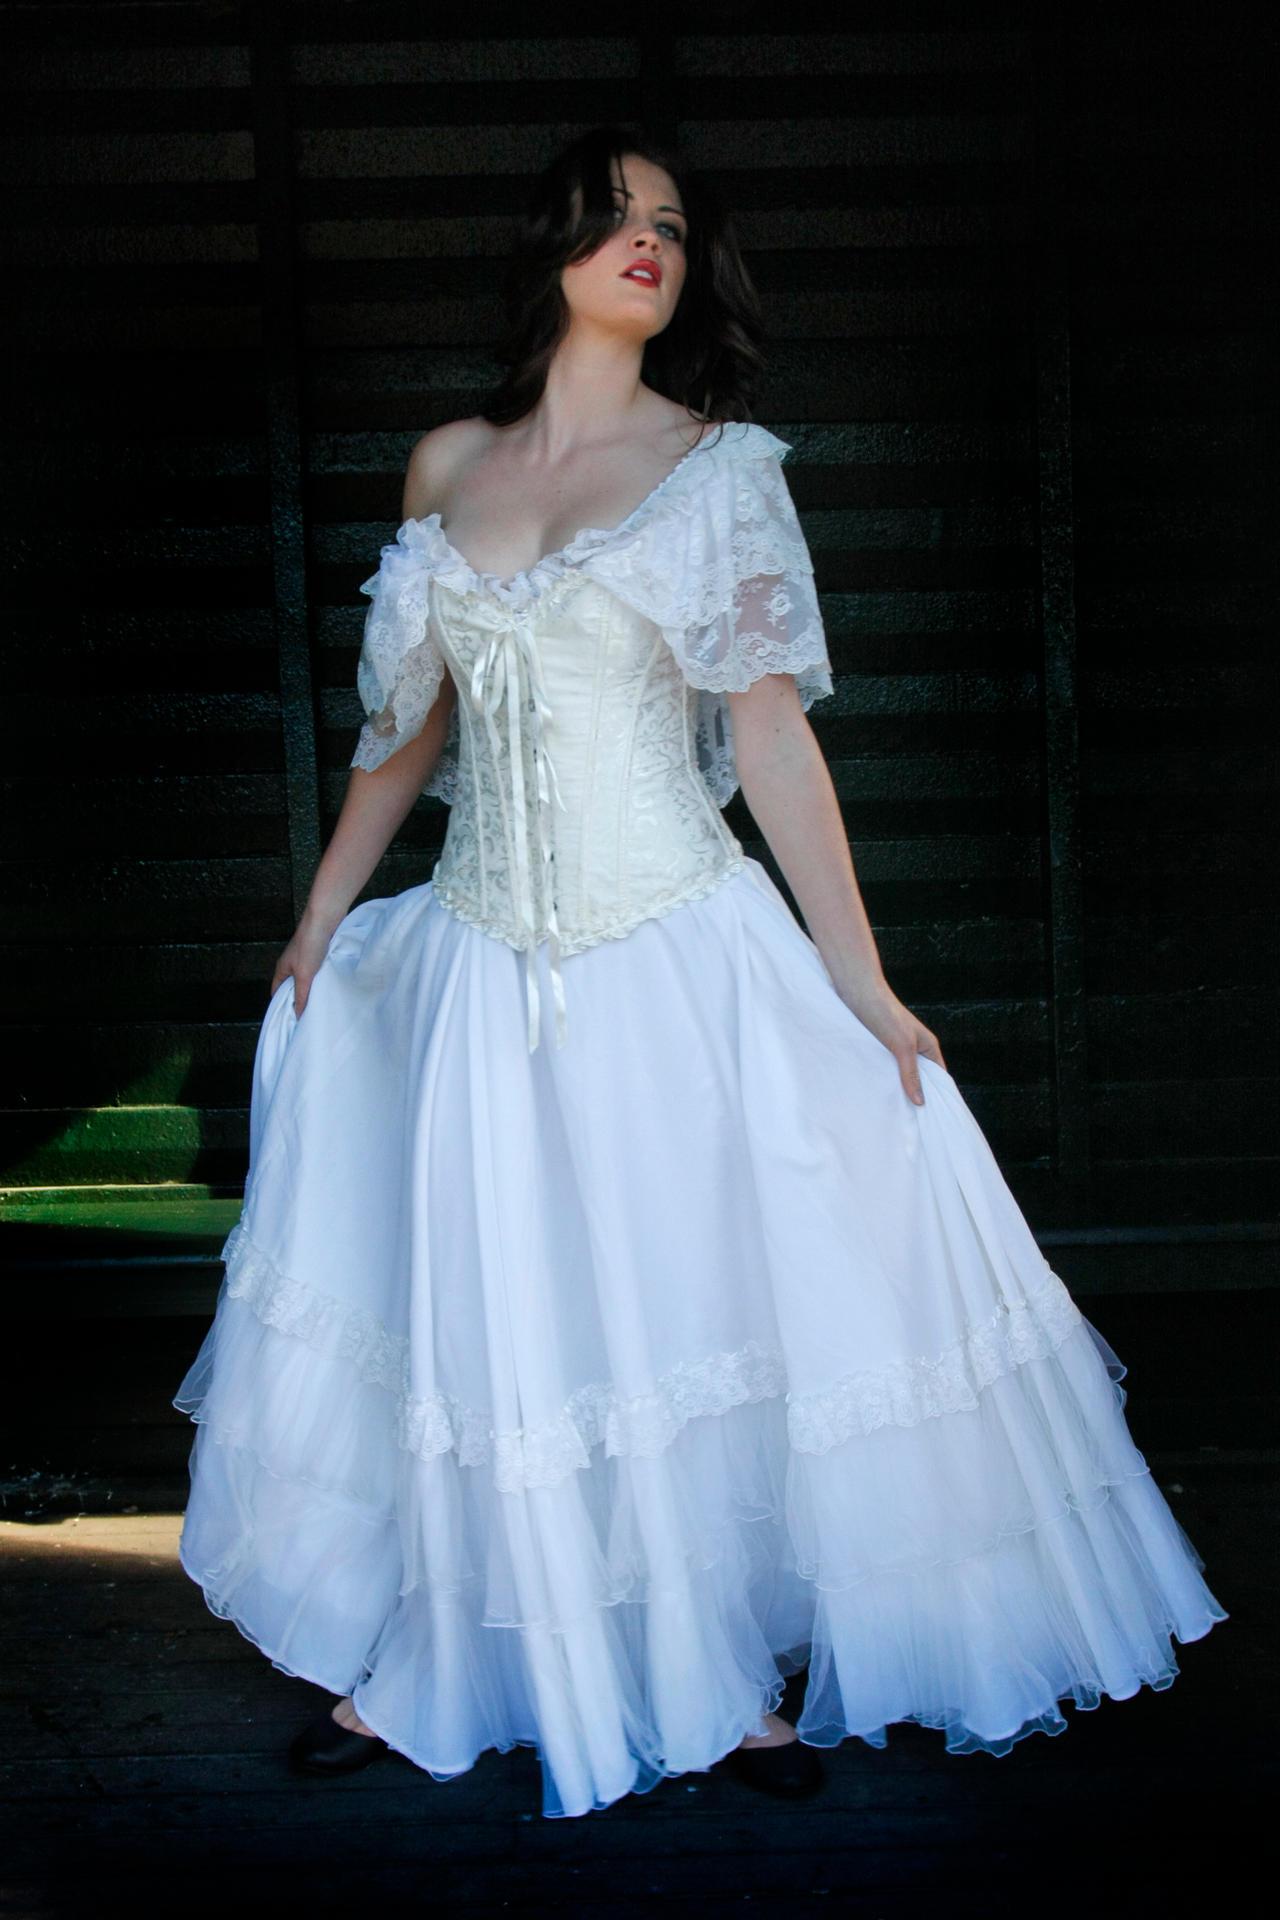 Danielle white dress 26